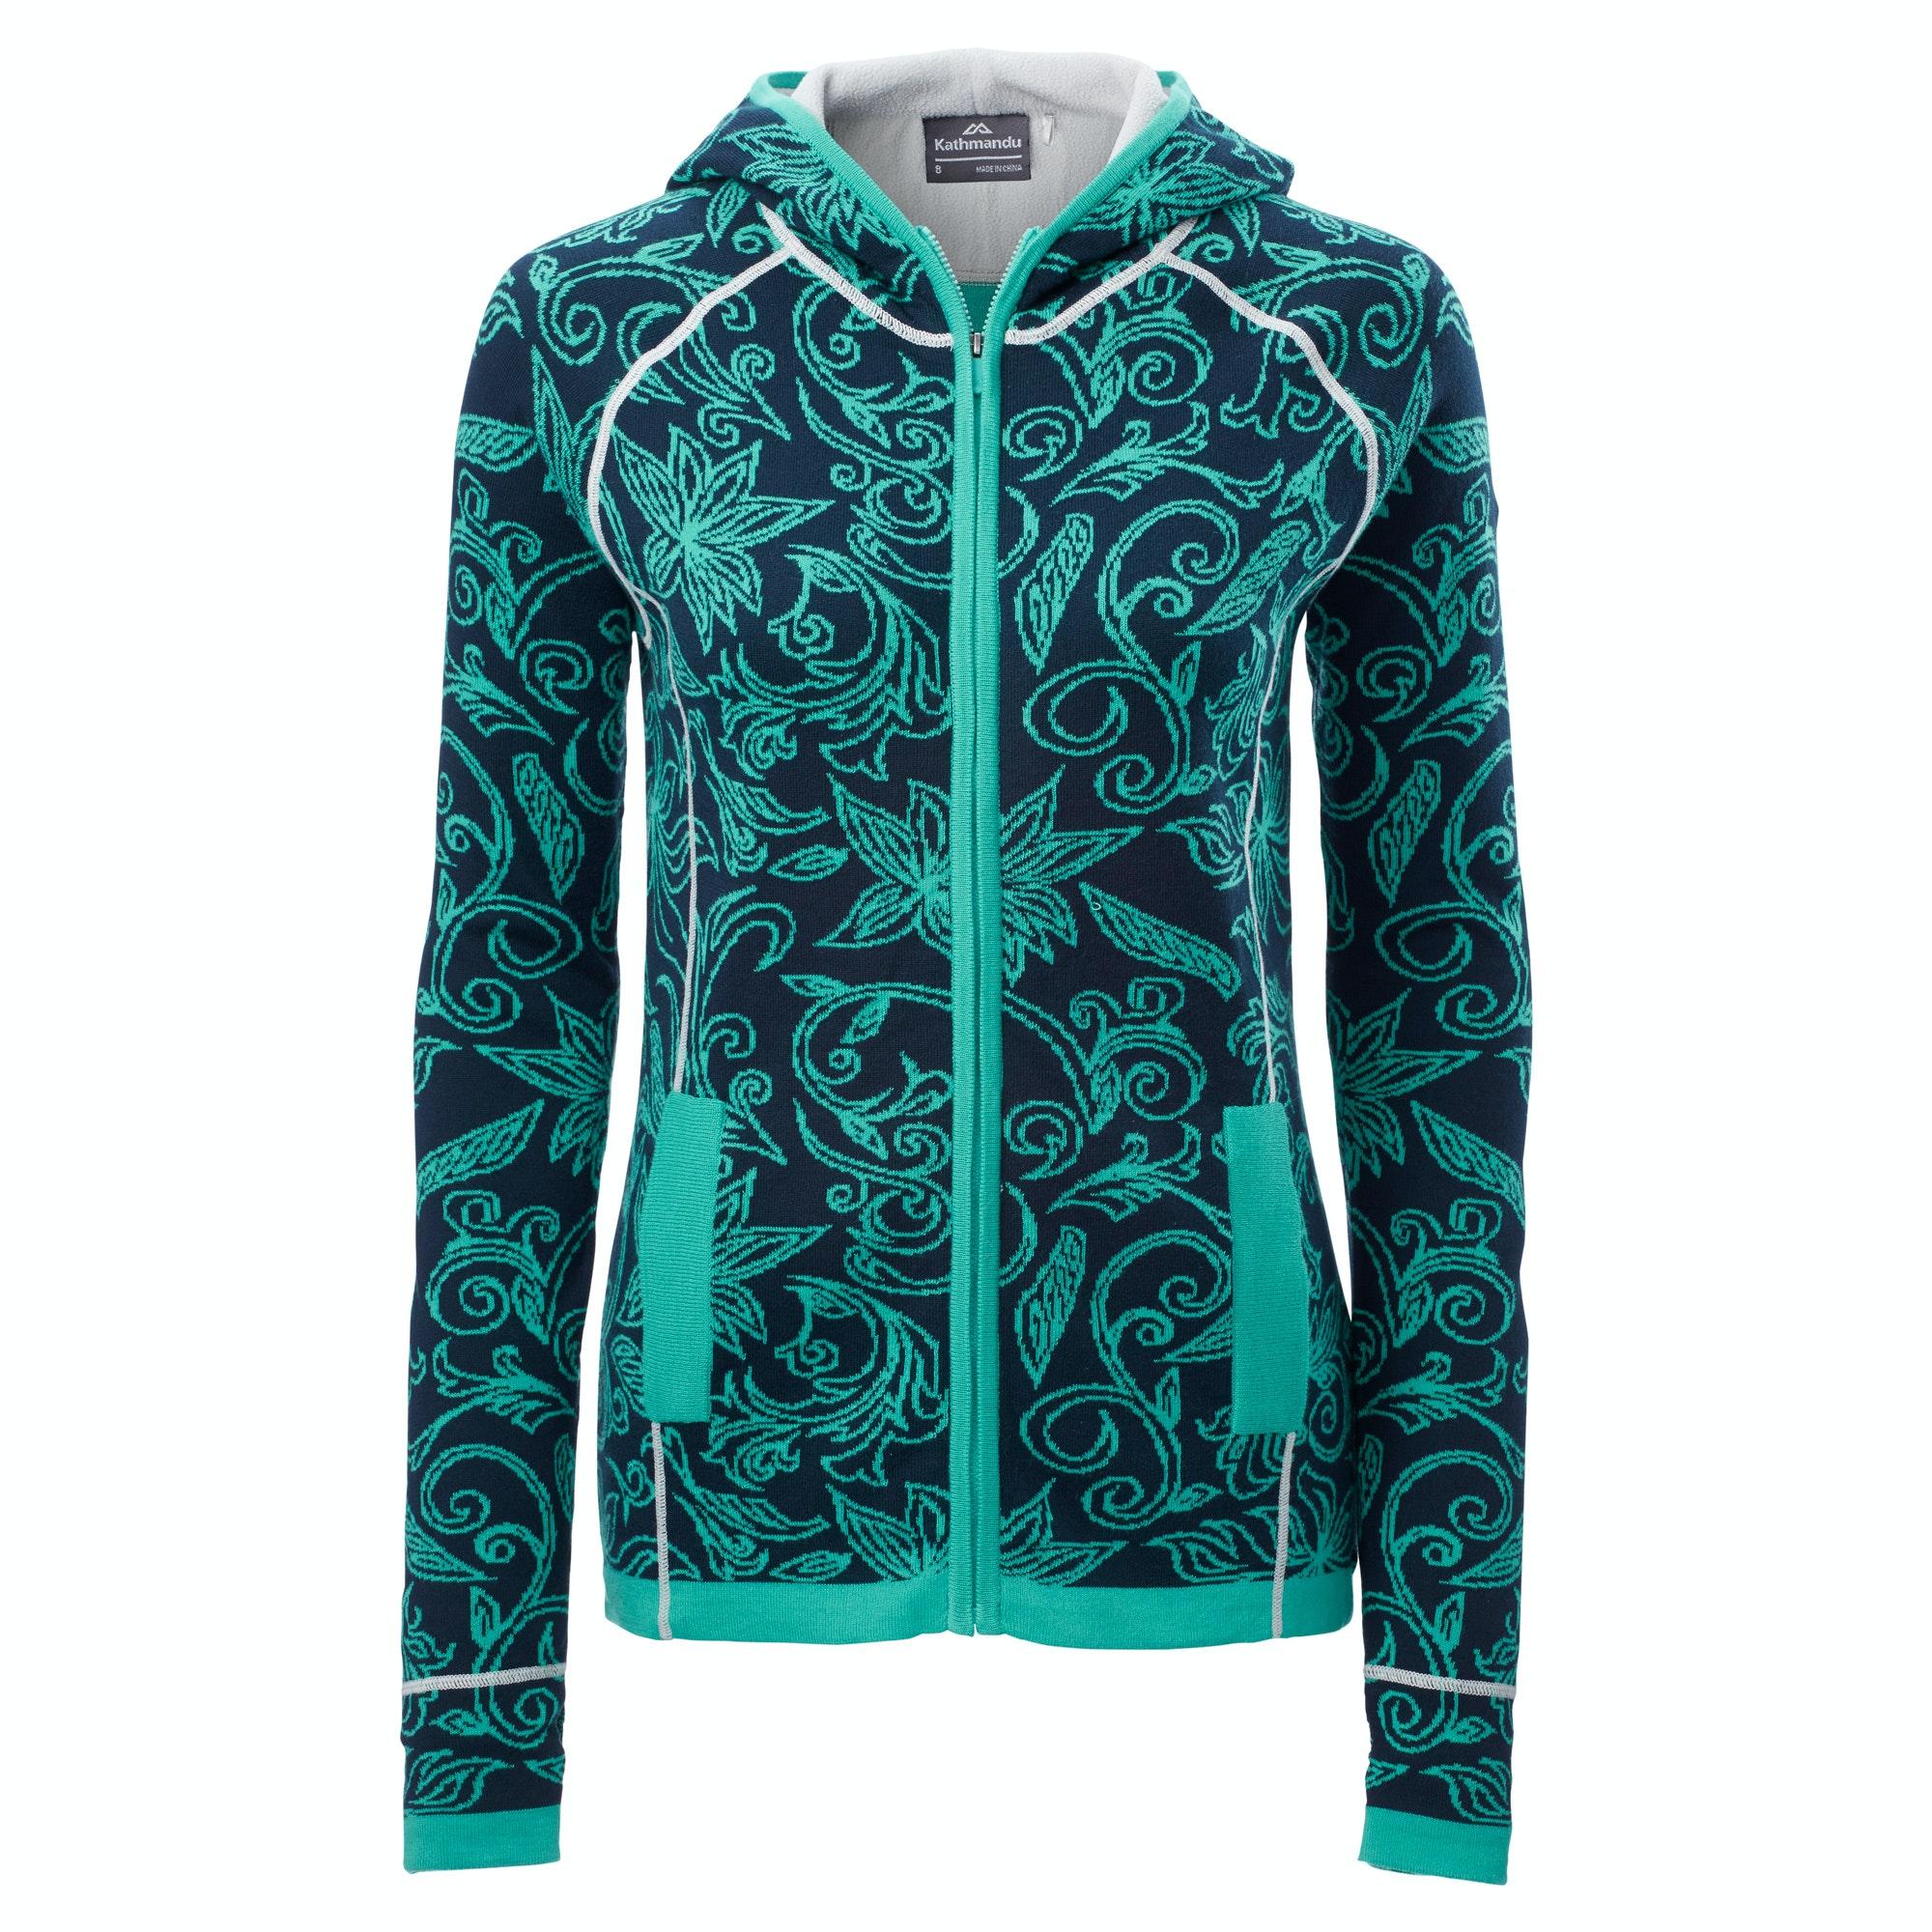 Knitting Pattern Ladies Hooded Jacket : Kathmandu Sanam Womens Organic Cotton Blend Knitted Hooded ...